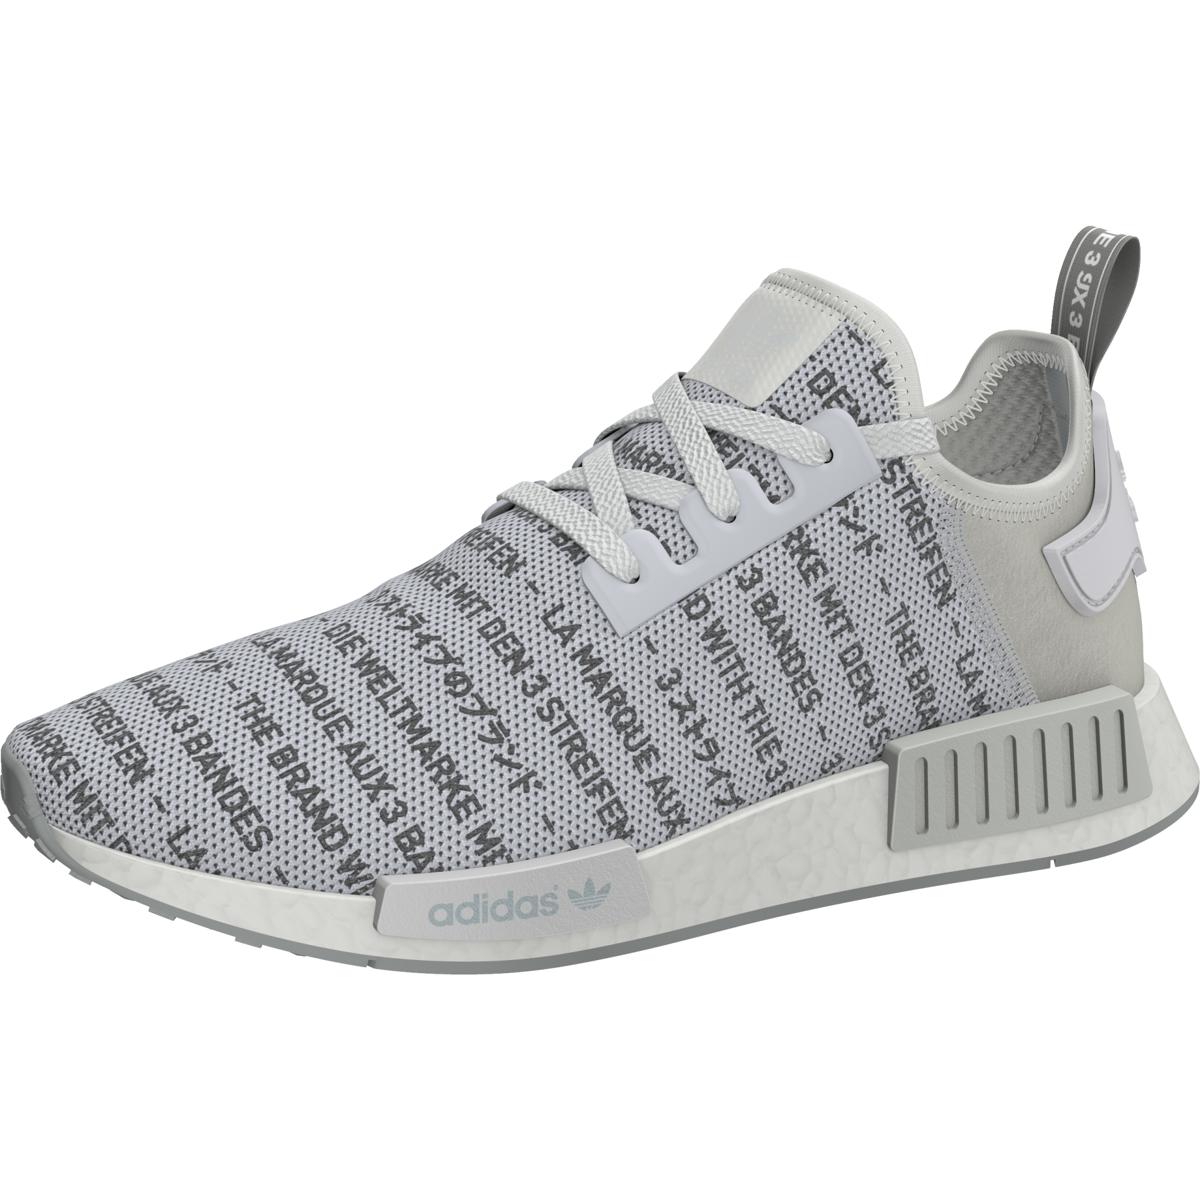 adidas nmd r1 whiteout shoes s76519 basketball shoes sklep koszykarski. Black Bedroom Furniture Sets. Home Design Ideas